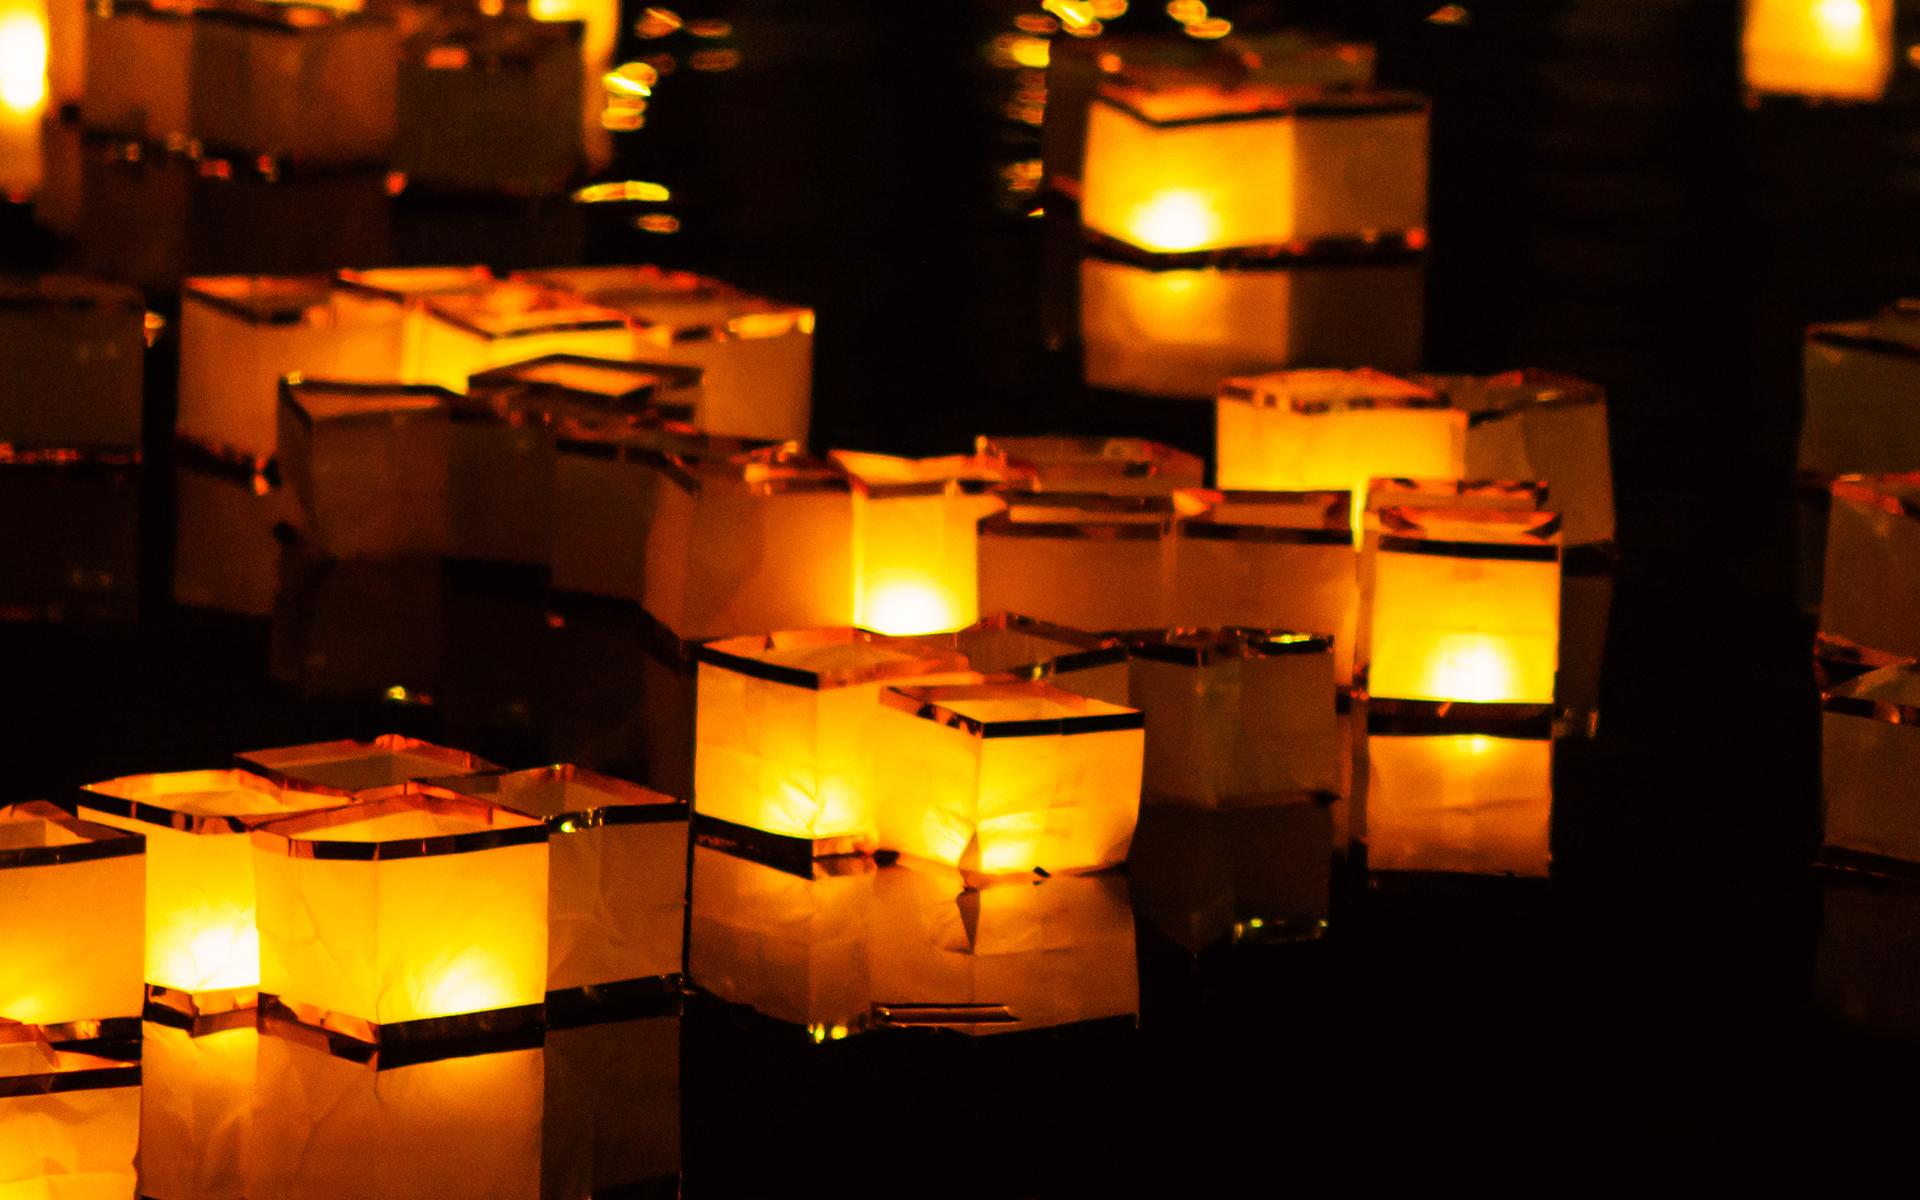 San Antonio Botanical Garden Honors Japanese Tradition With Water Lantern Release Artslut